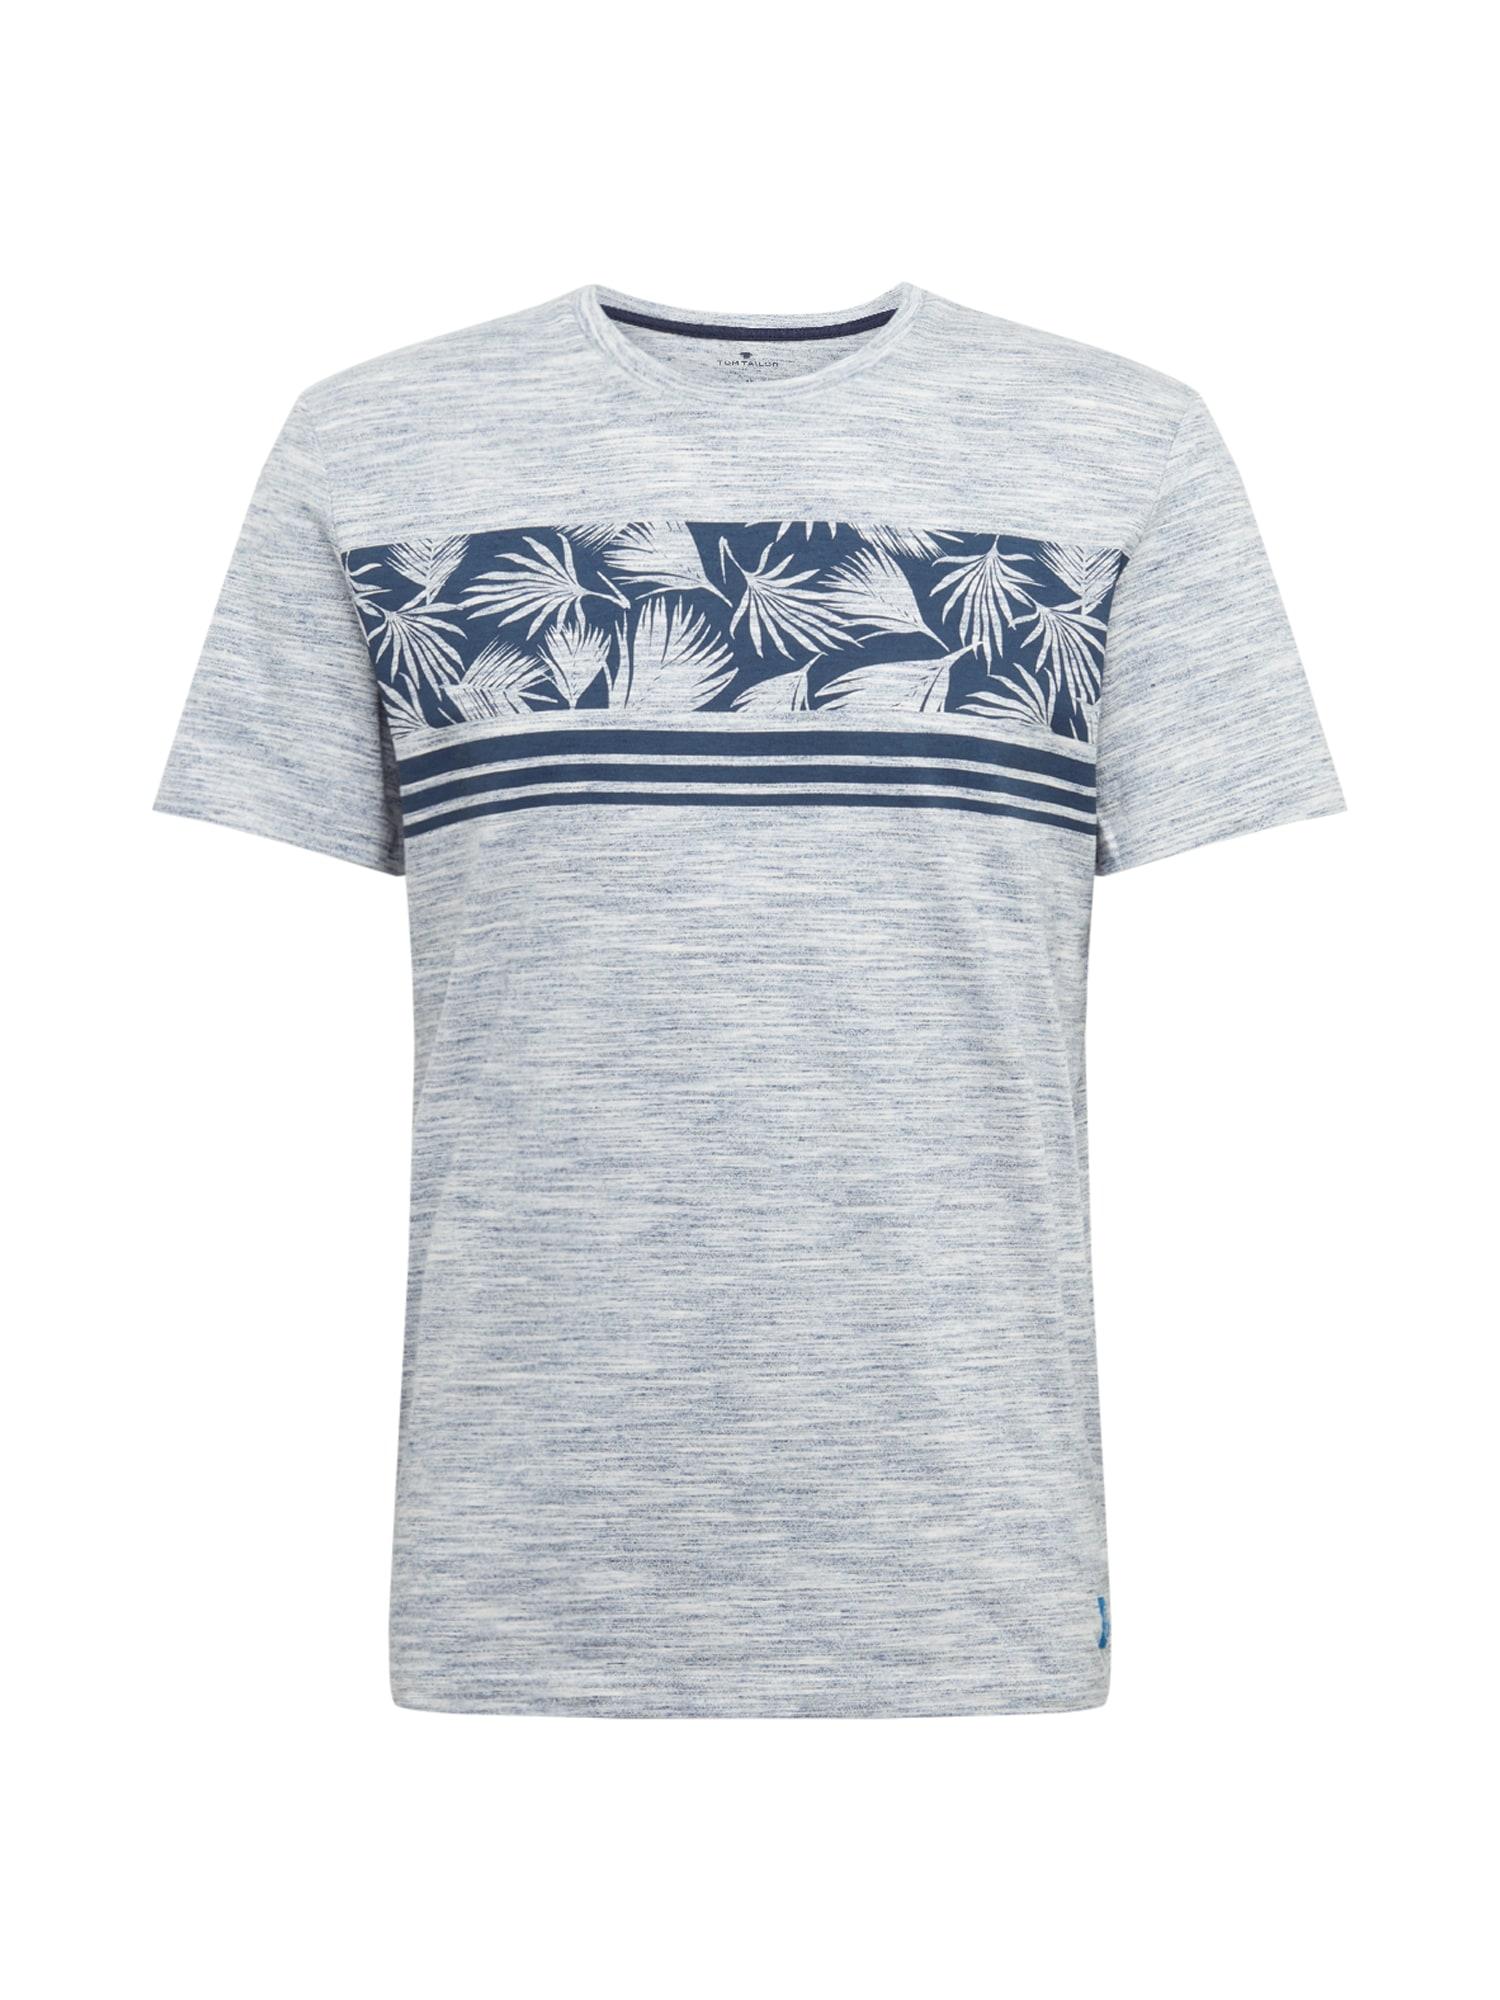 TOM TAILOR Tričko  šedý melír / modrá